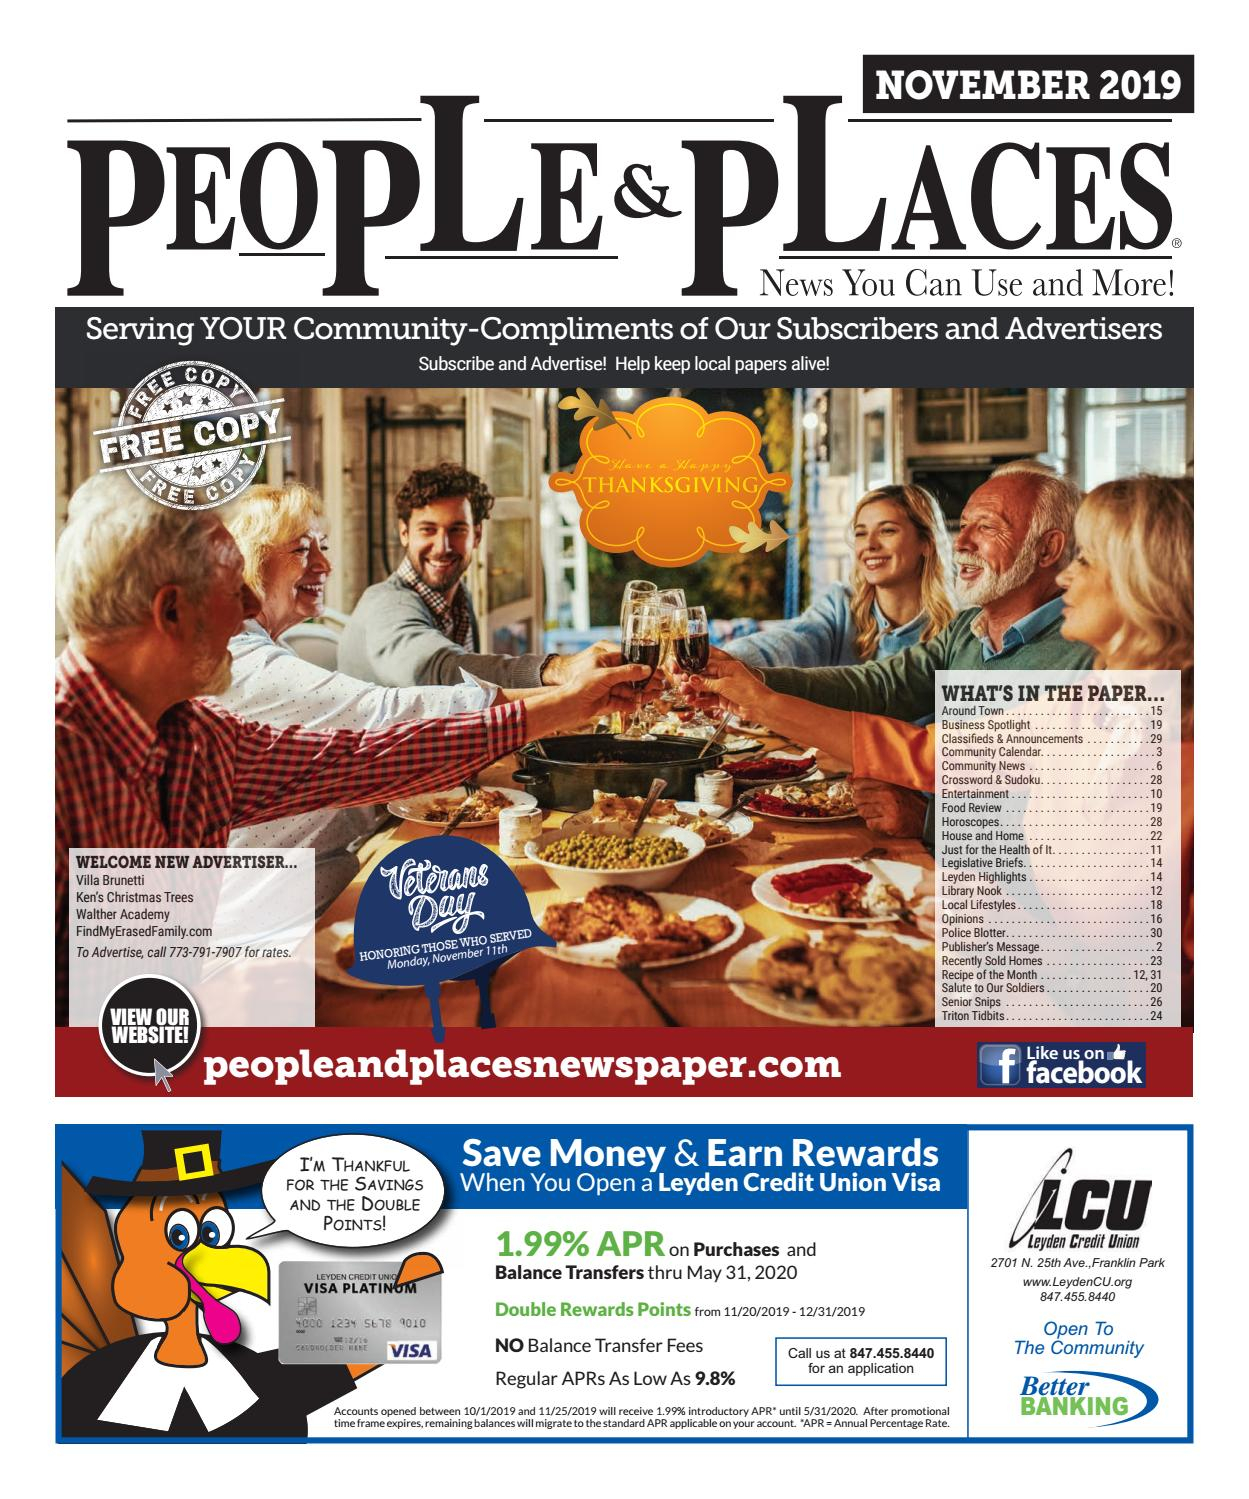 November 2019 People & Places Newspaperjennifer Creative With Regard To Turning Stone Bingo Calendar 2021 November